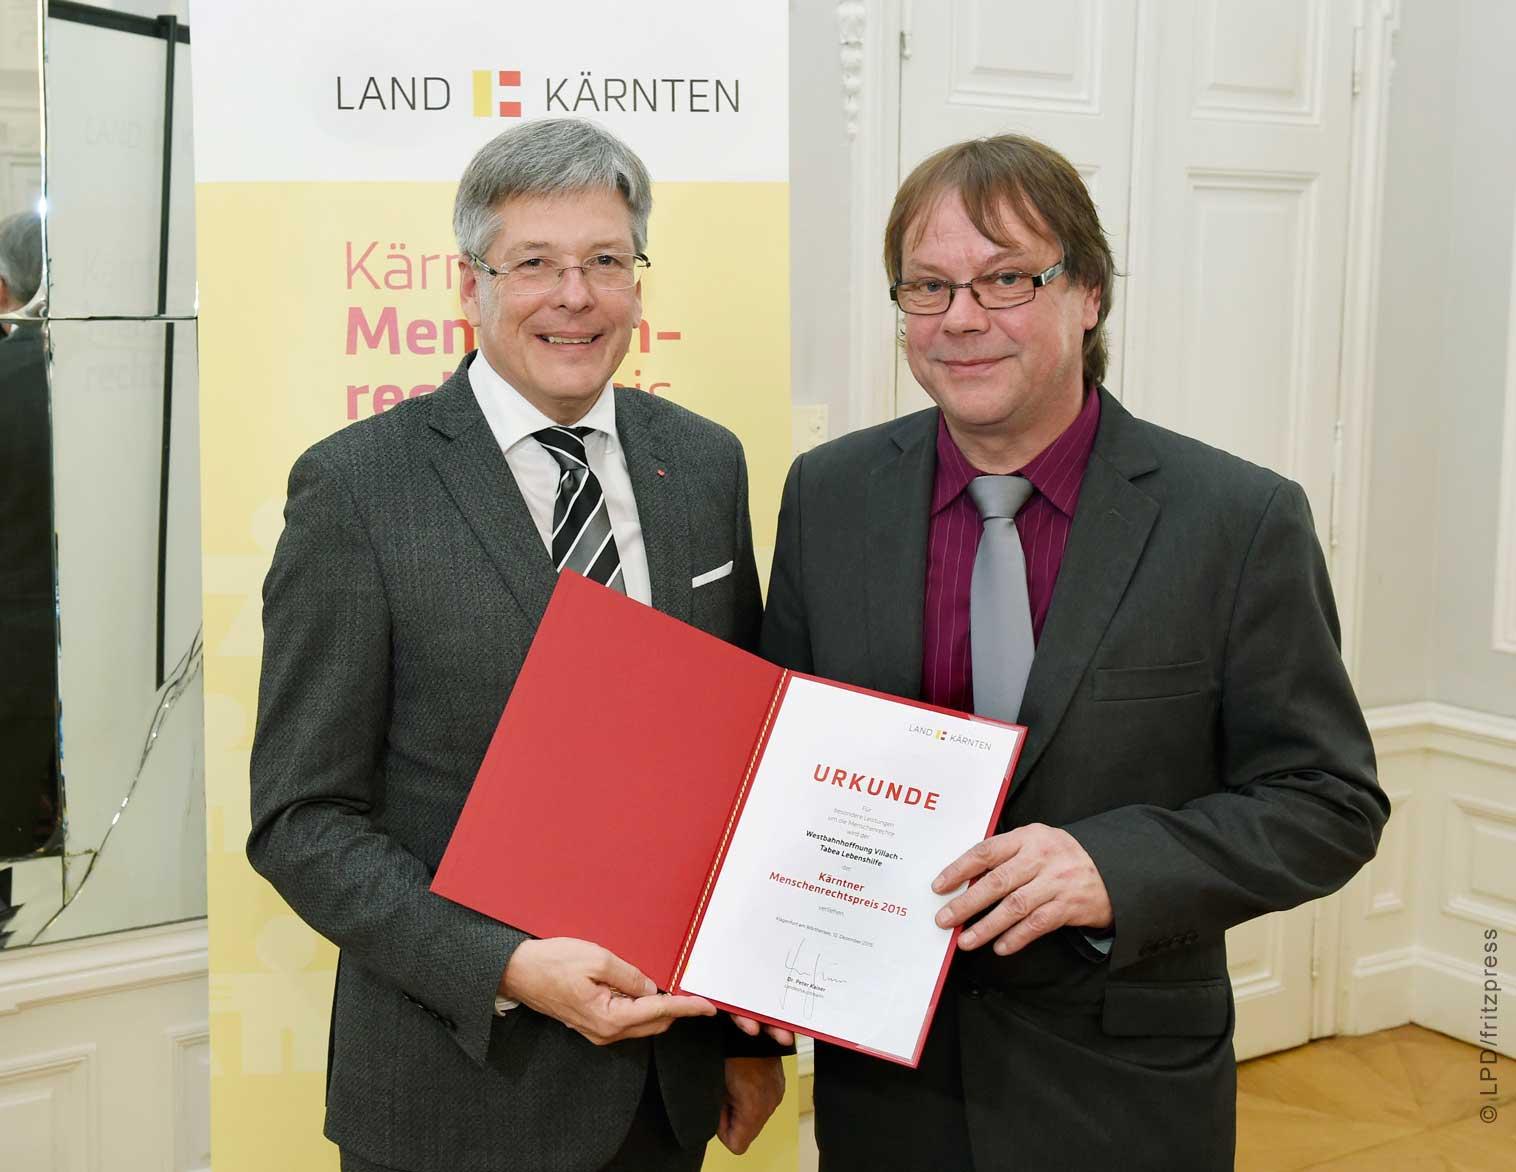 Kärntner Menschenrechtspreis gewonnen